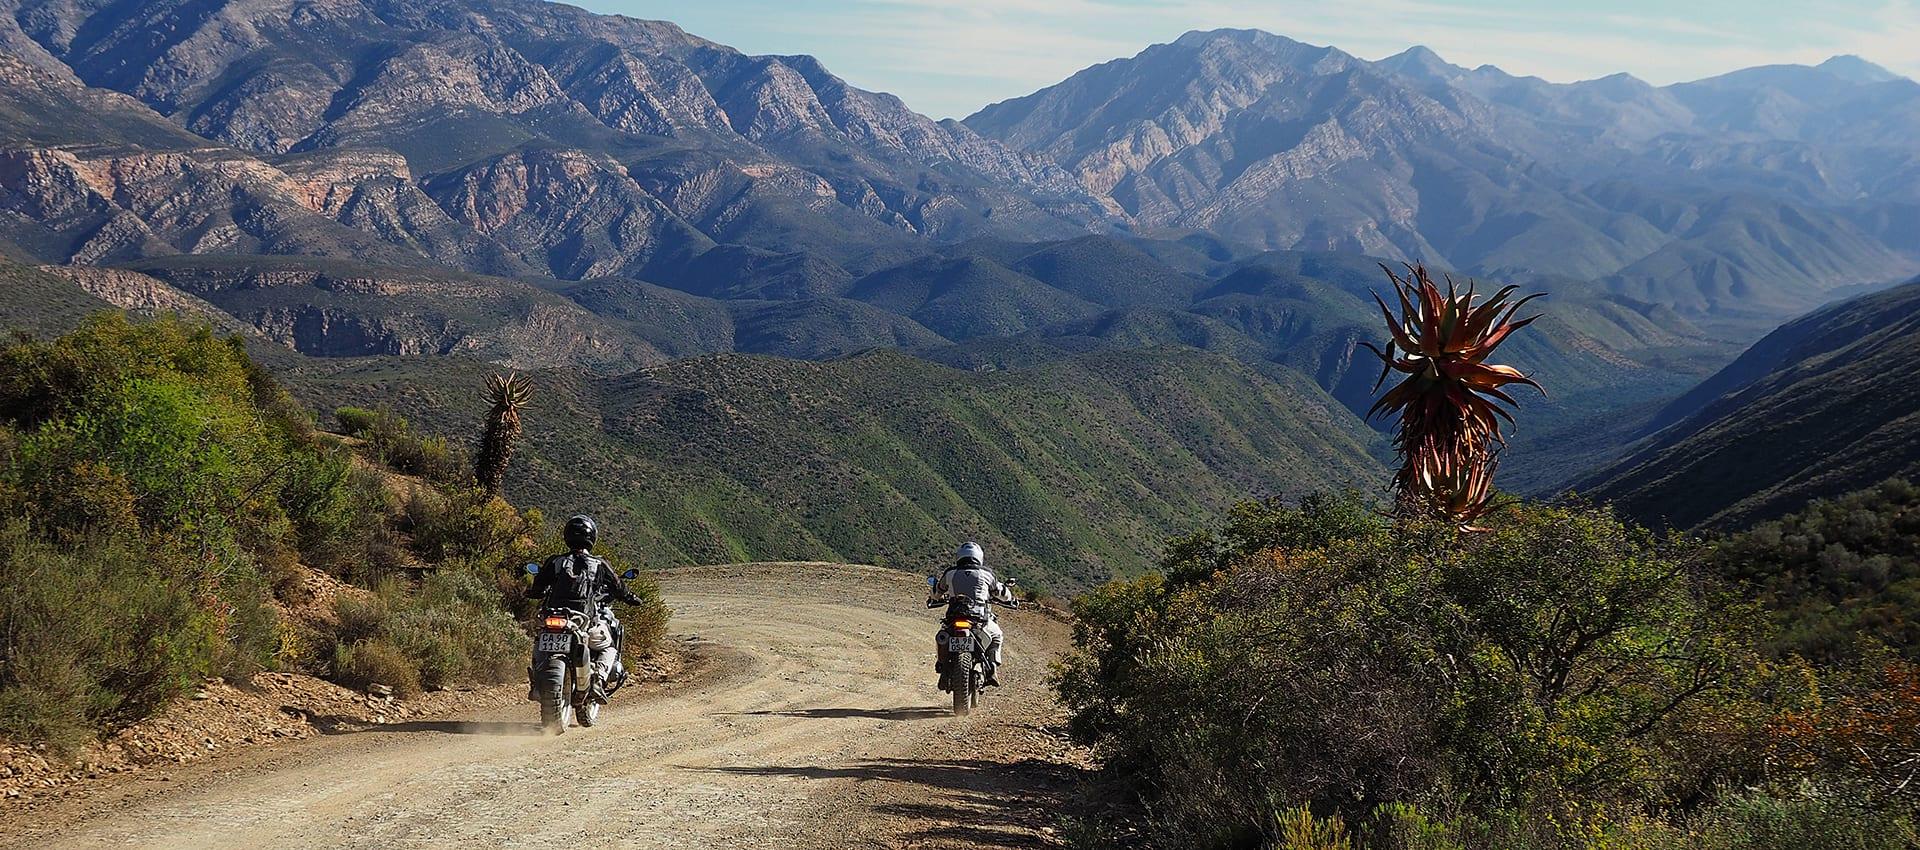 Overzicht van onze motorreizen in Afrika naar Namibie, Senegal, Oeganda, Zuid-Afrika, Marokko,